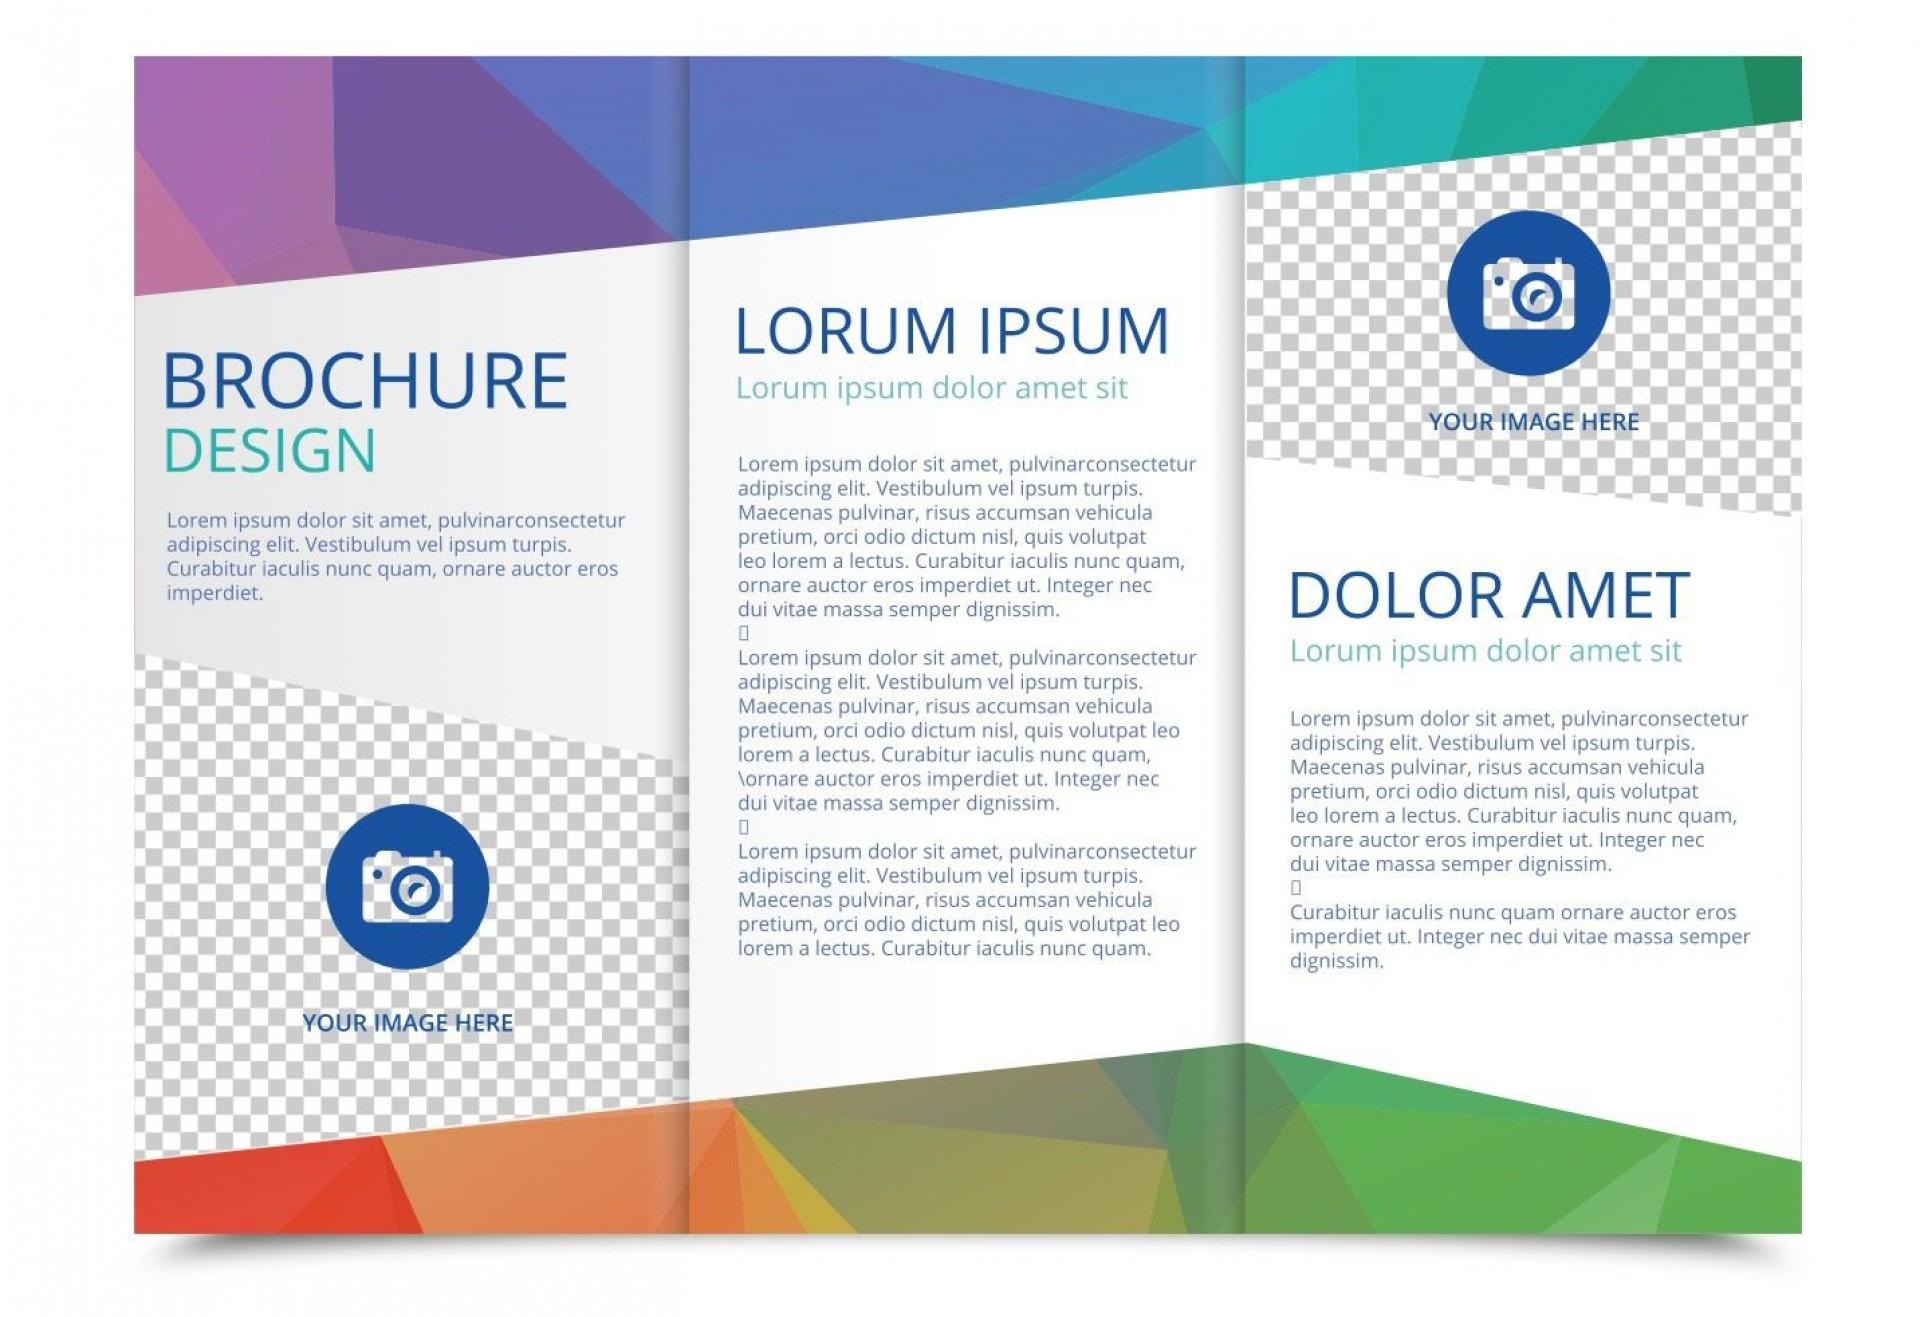 005 Stirring Free Tri Fold Brochure Template Sample  Photoshop Illustrator Microsoft Word 20101920